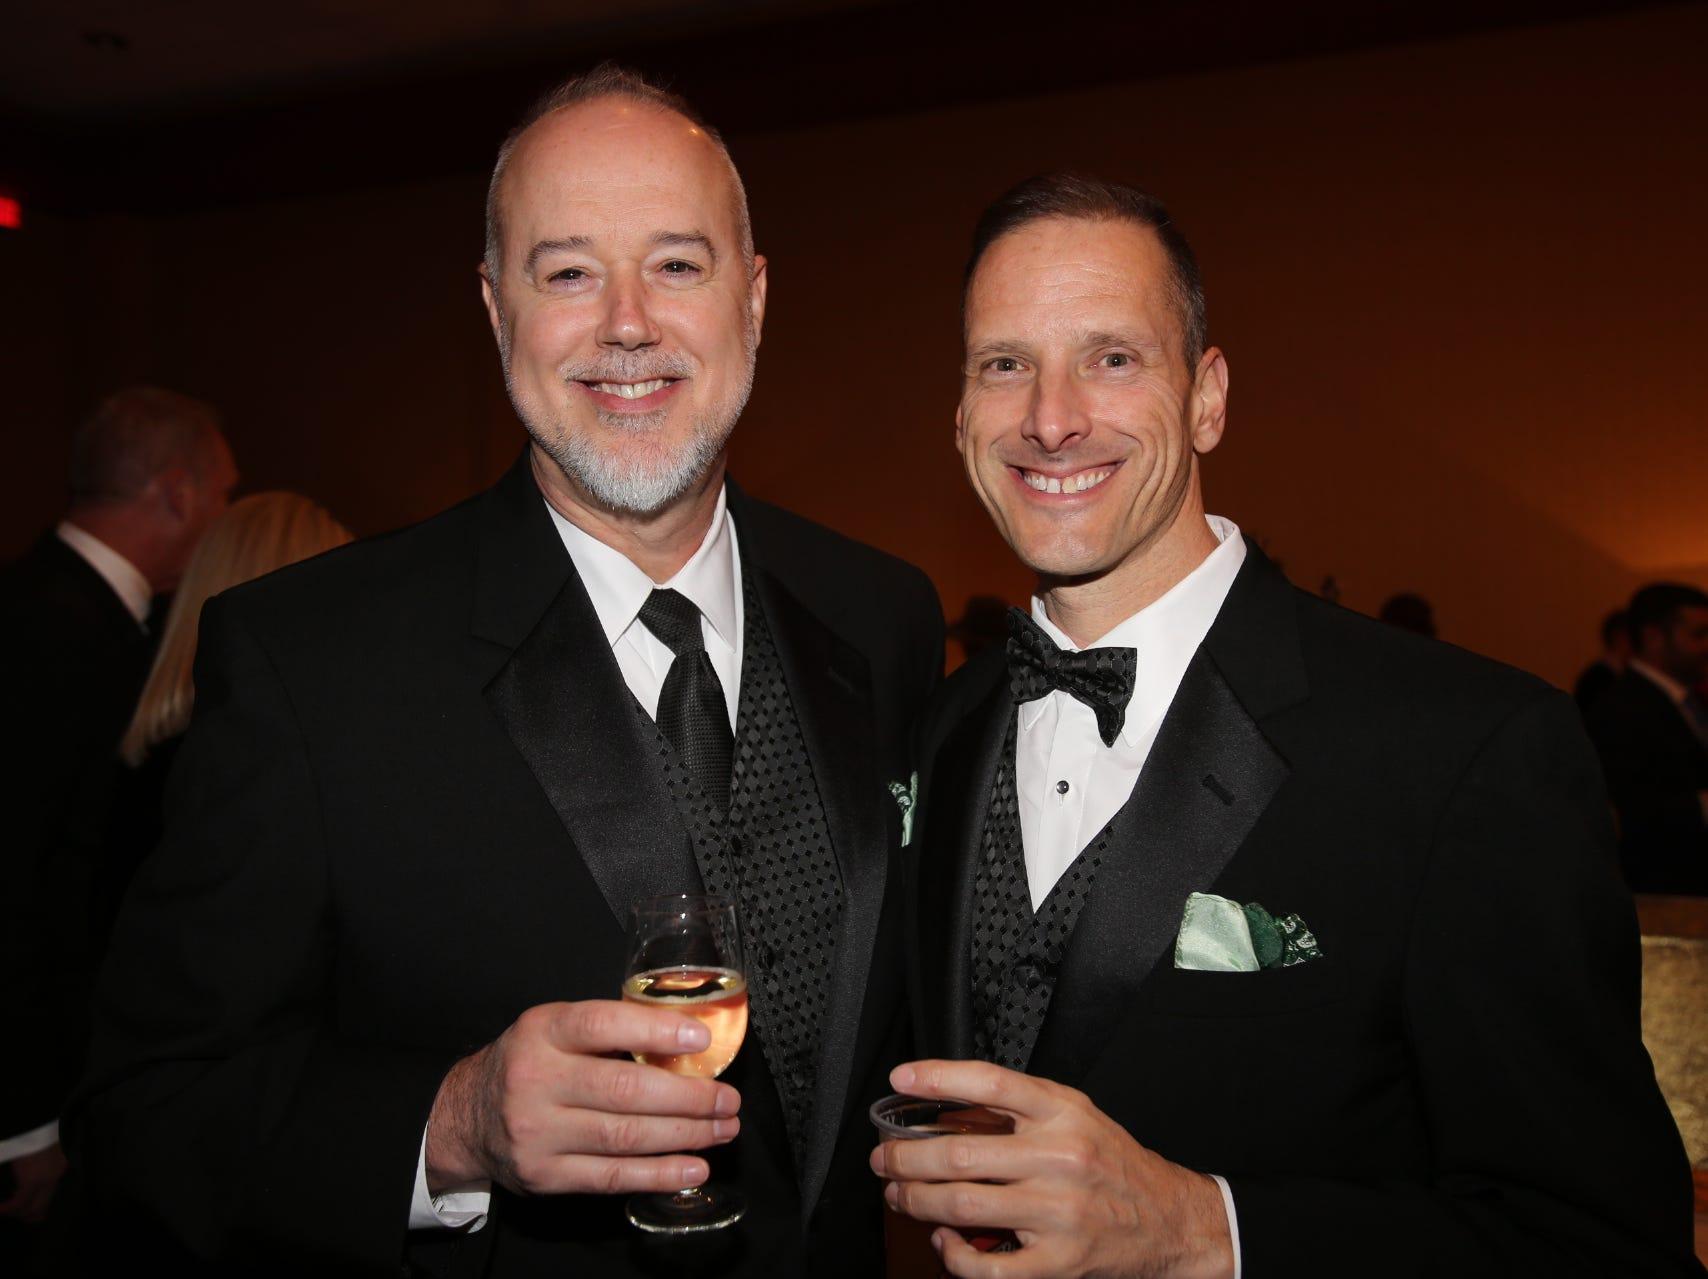 Tony Dunn and Michial Harris